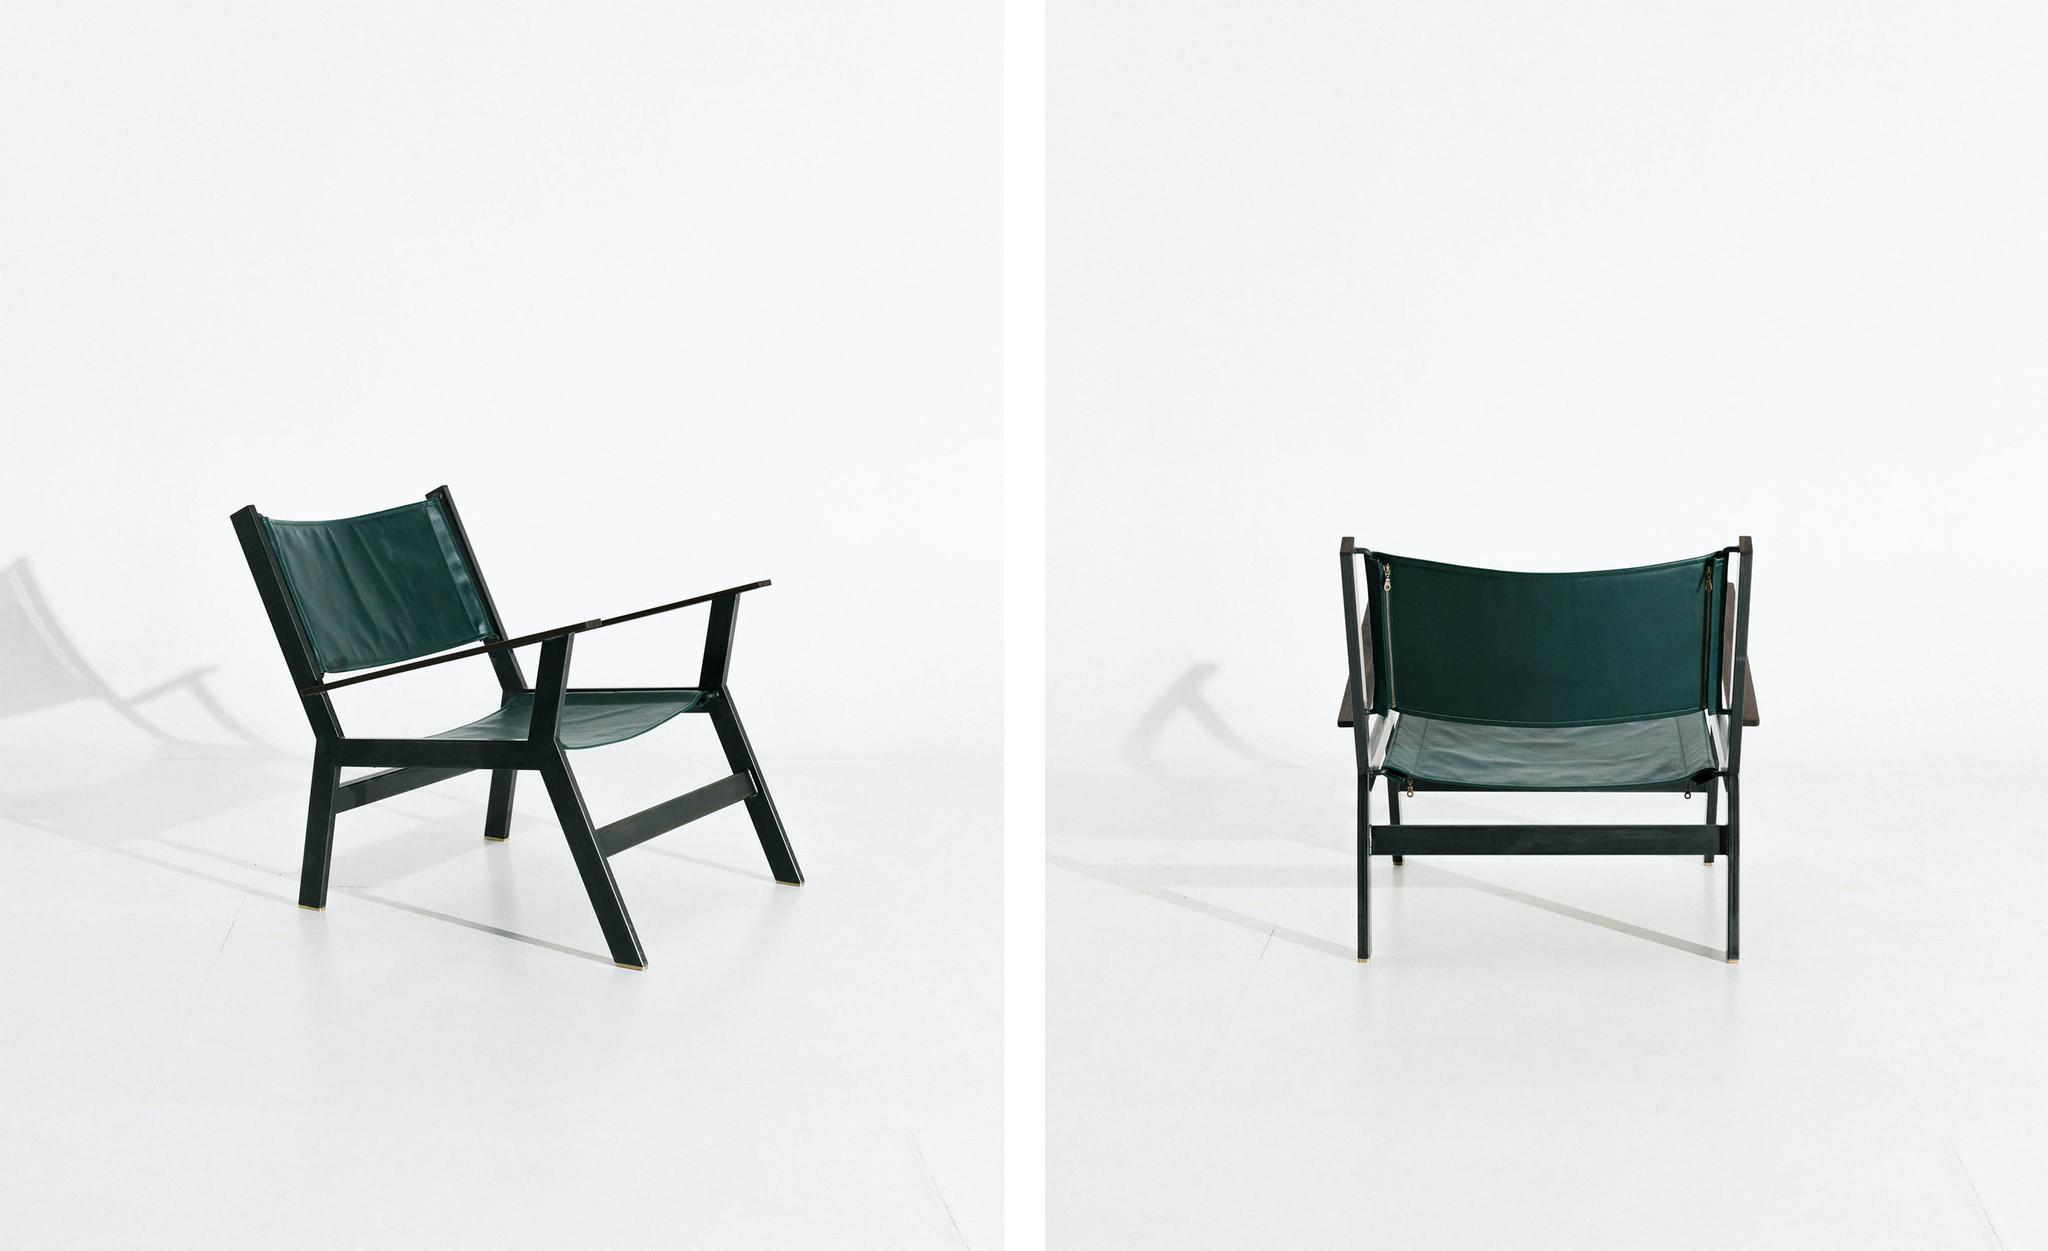 Green designer chair